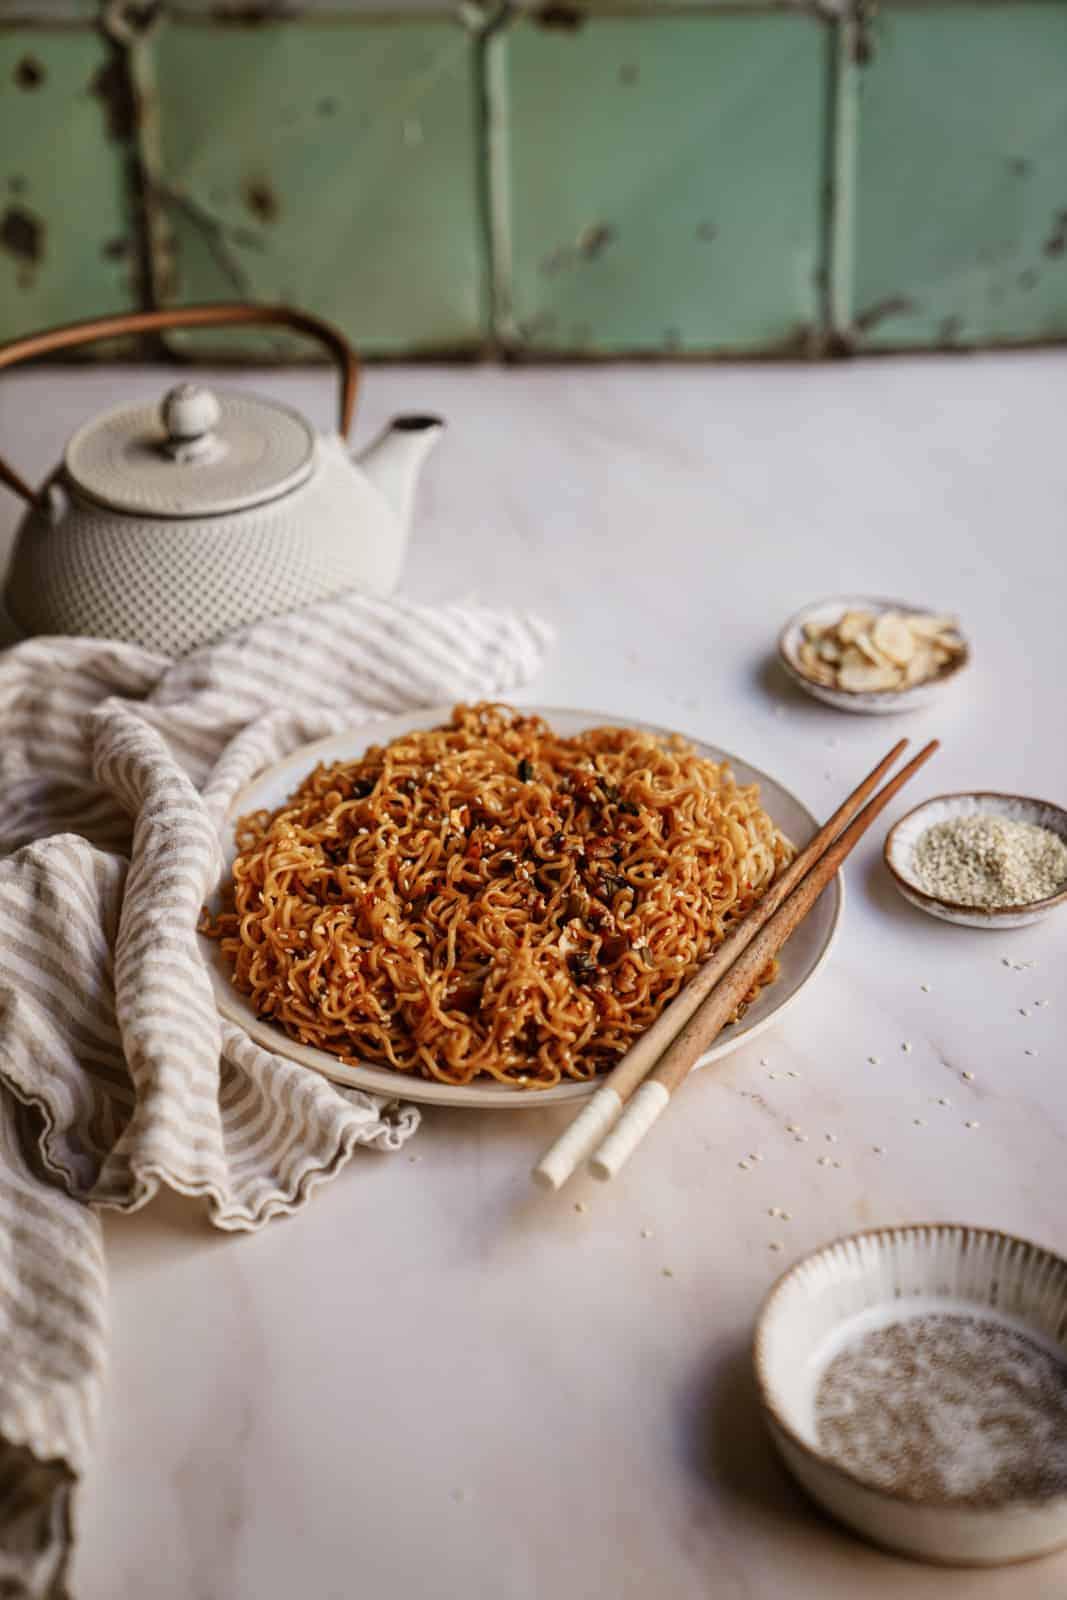 Vegan Sesame Garlic Noodles on a plate with chopsticks